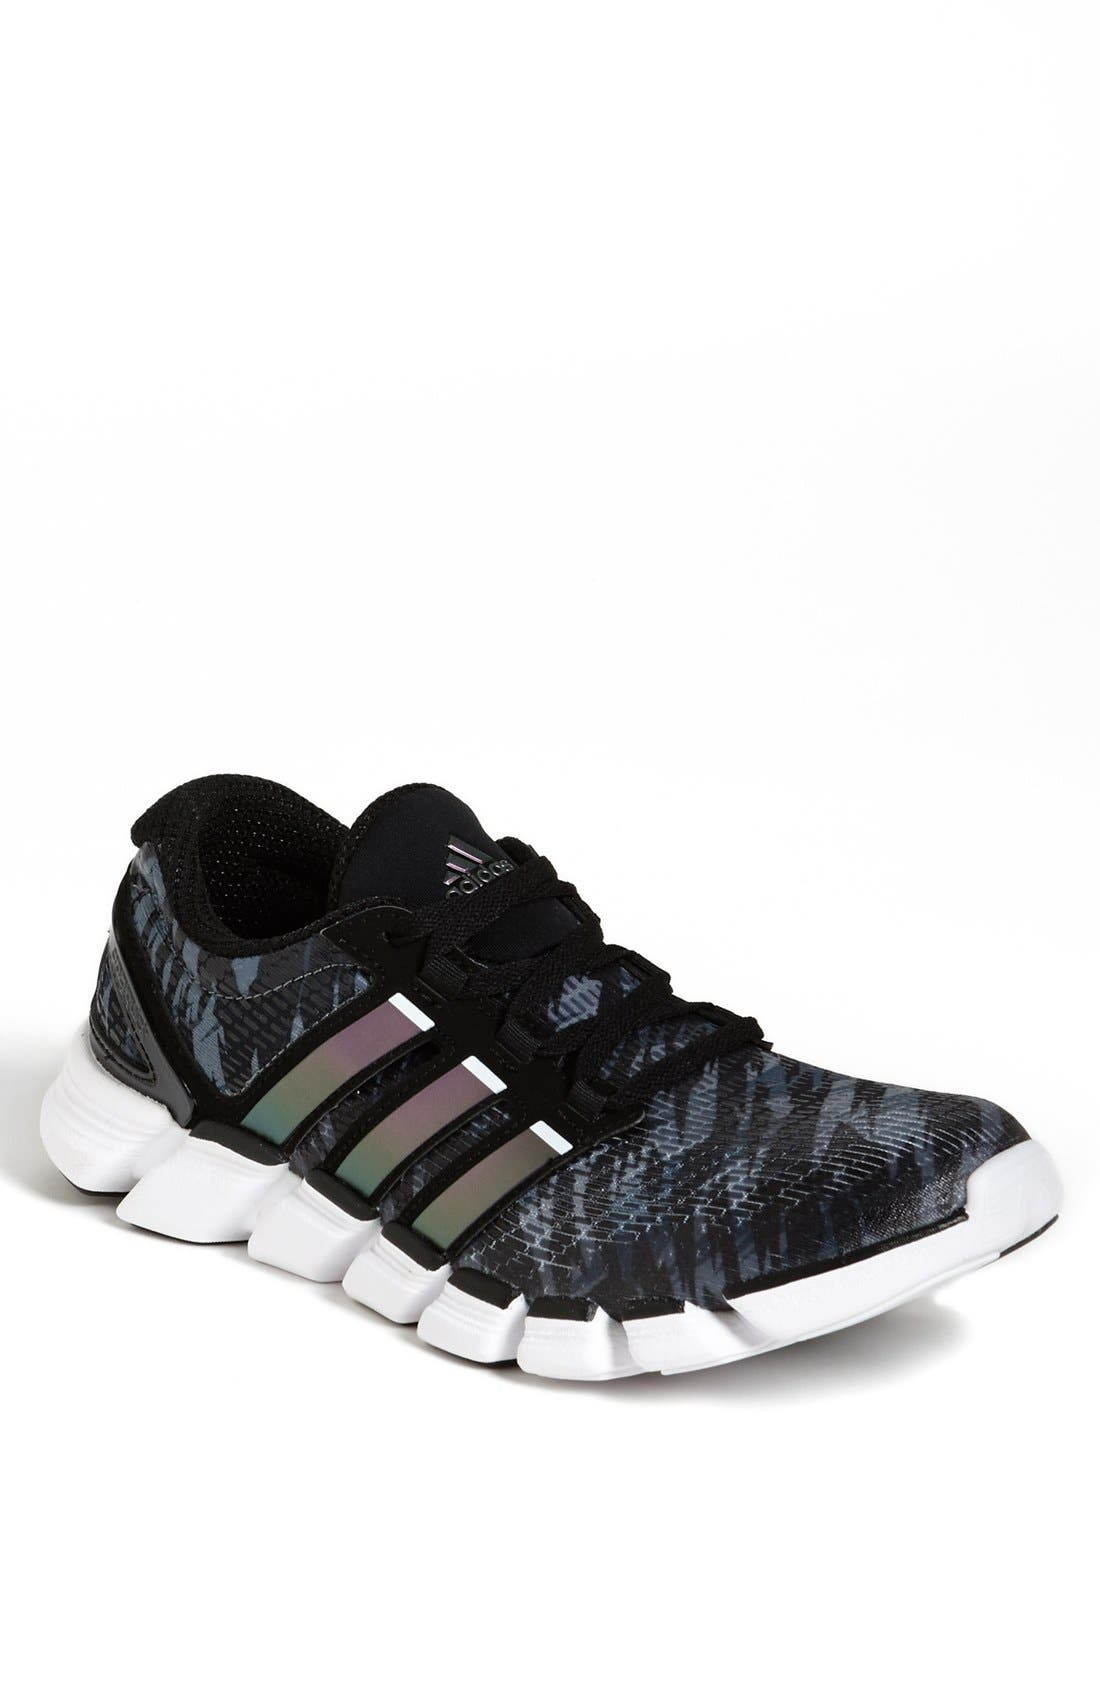 Alternate Image 1 Selected - adidas 'adiPure CrazyQuick' Running Shoe (Men)